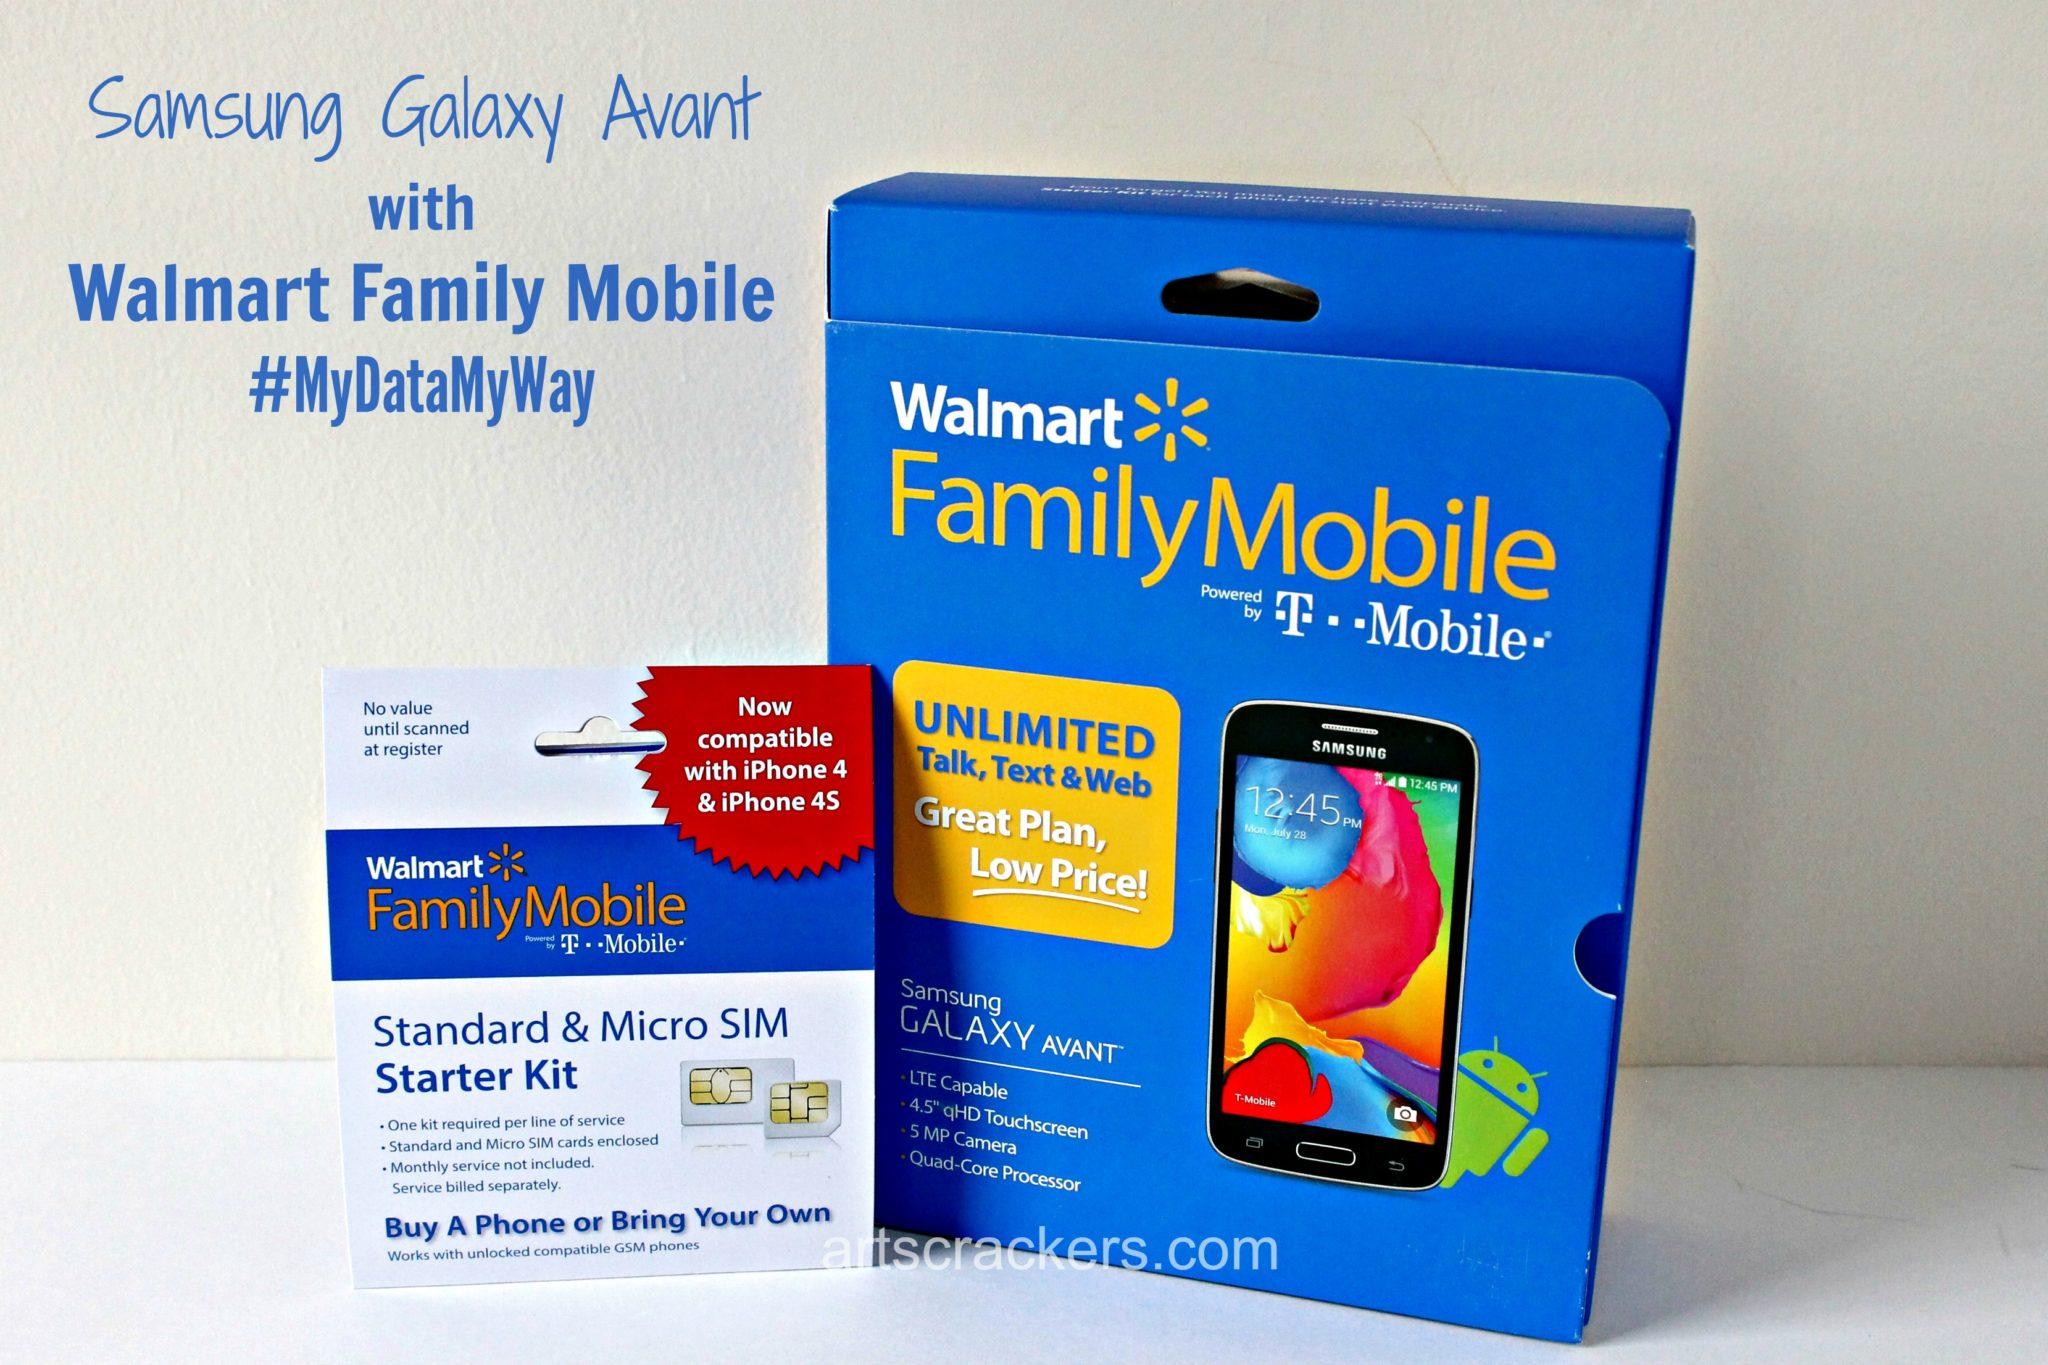 Samsung Galaxy Avant Walmart Family Mobile